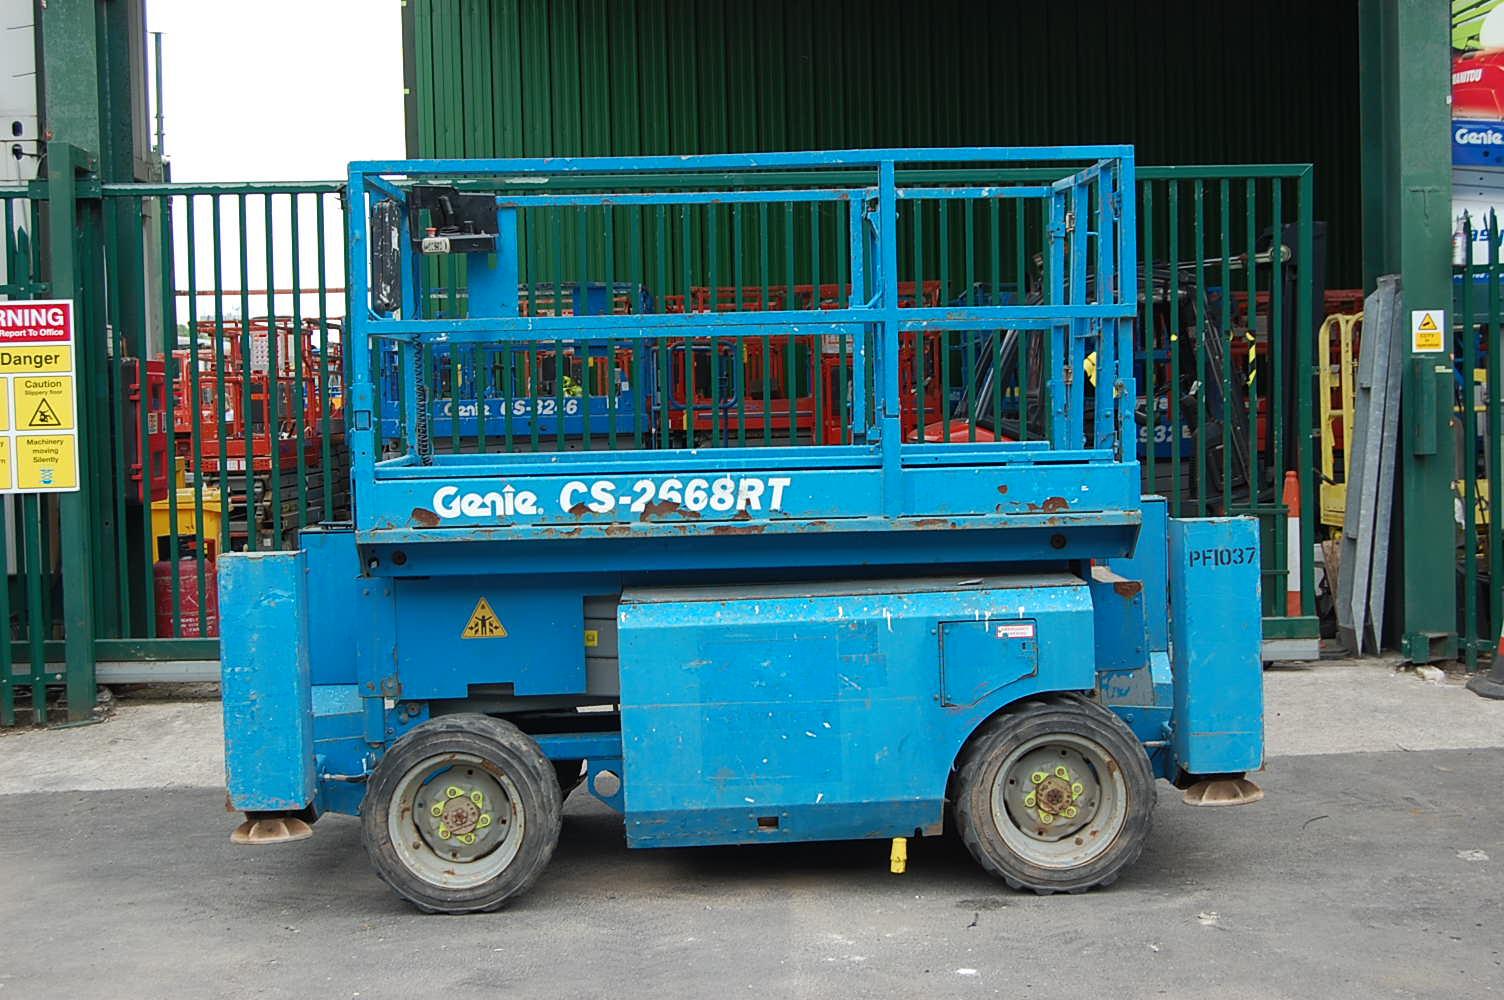 2010  Genie 2668RT Rough Terrain Diesel Scissor Lift 10m